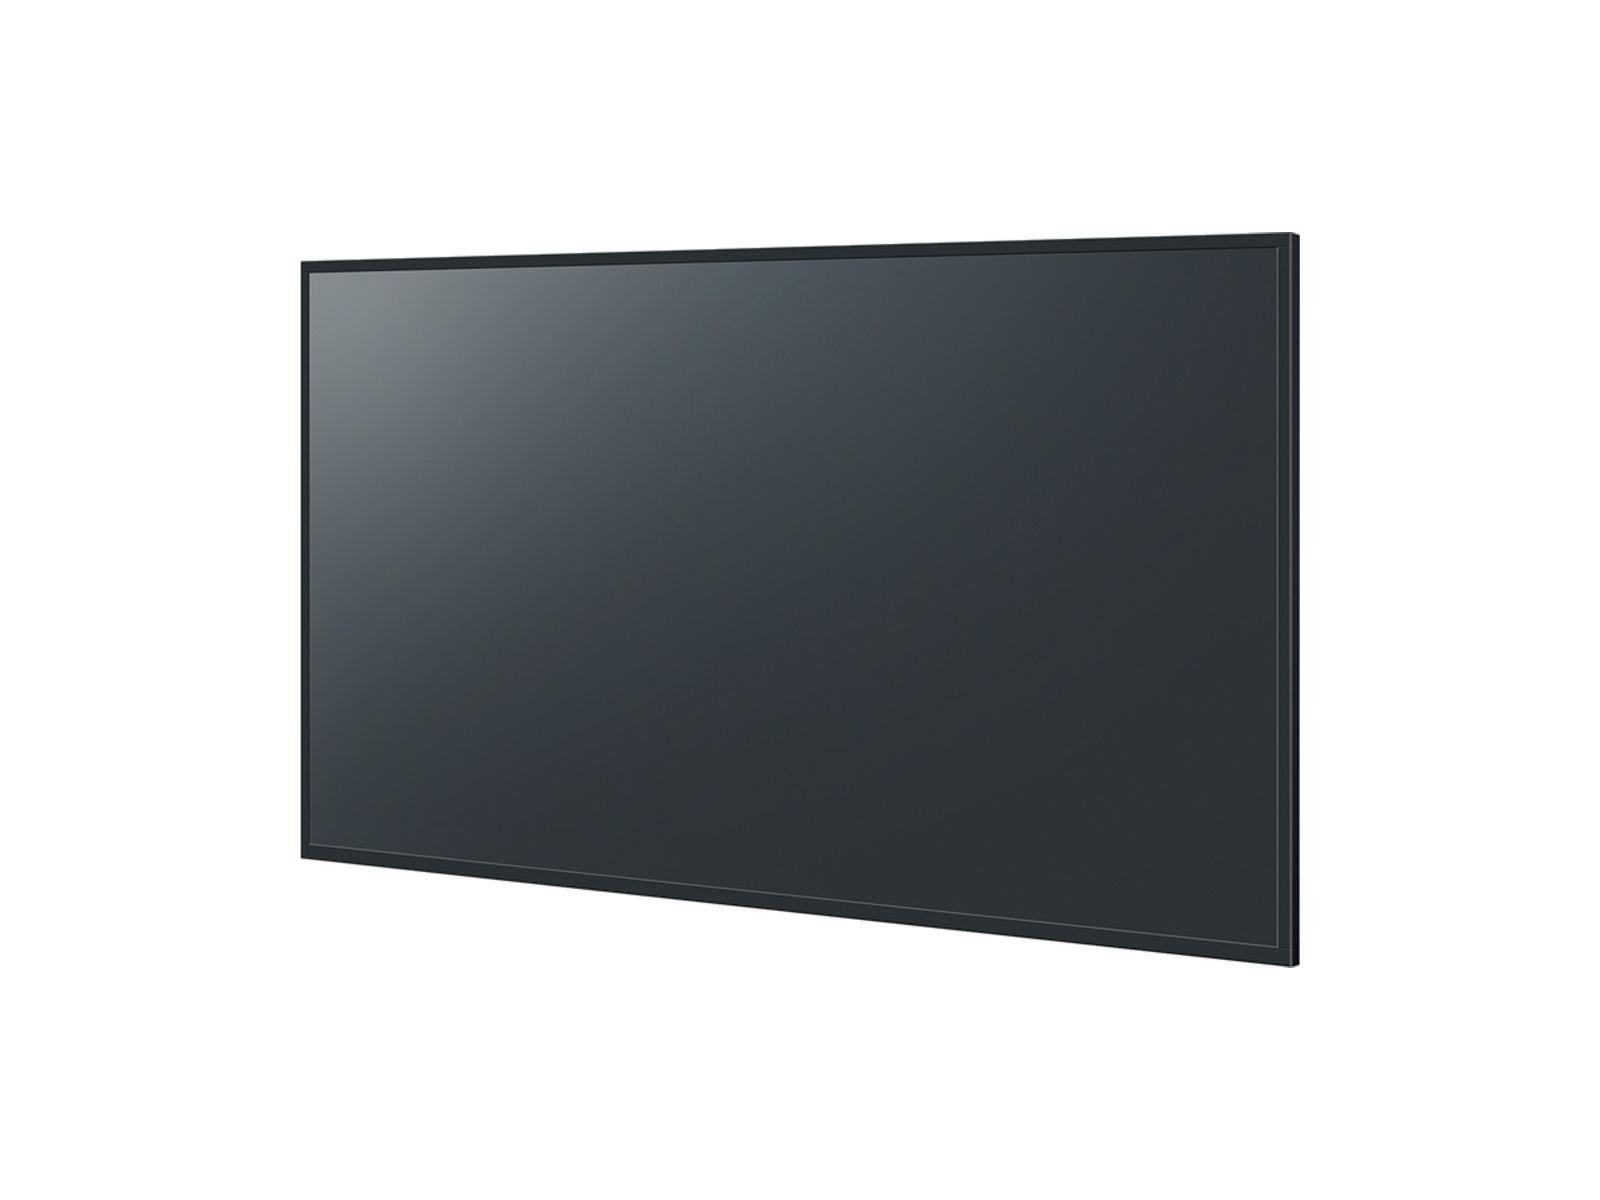 "Panasonic TH-75SQ1-IR | 189 cm 75"" UHD LCD-Display, LED, 500 cd/m²,, LAN, USB Mediaplayer, Lautsprecher, Infrarot-Touch"